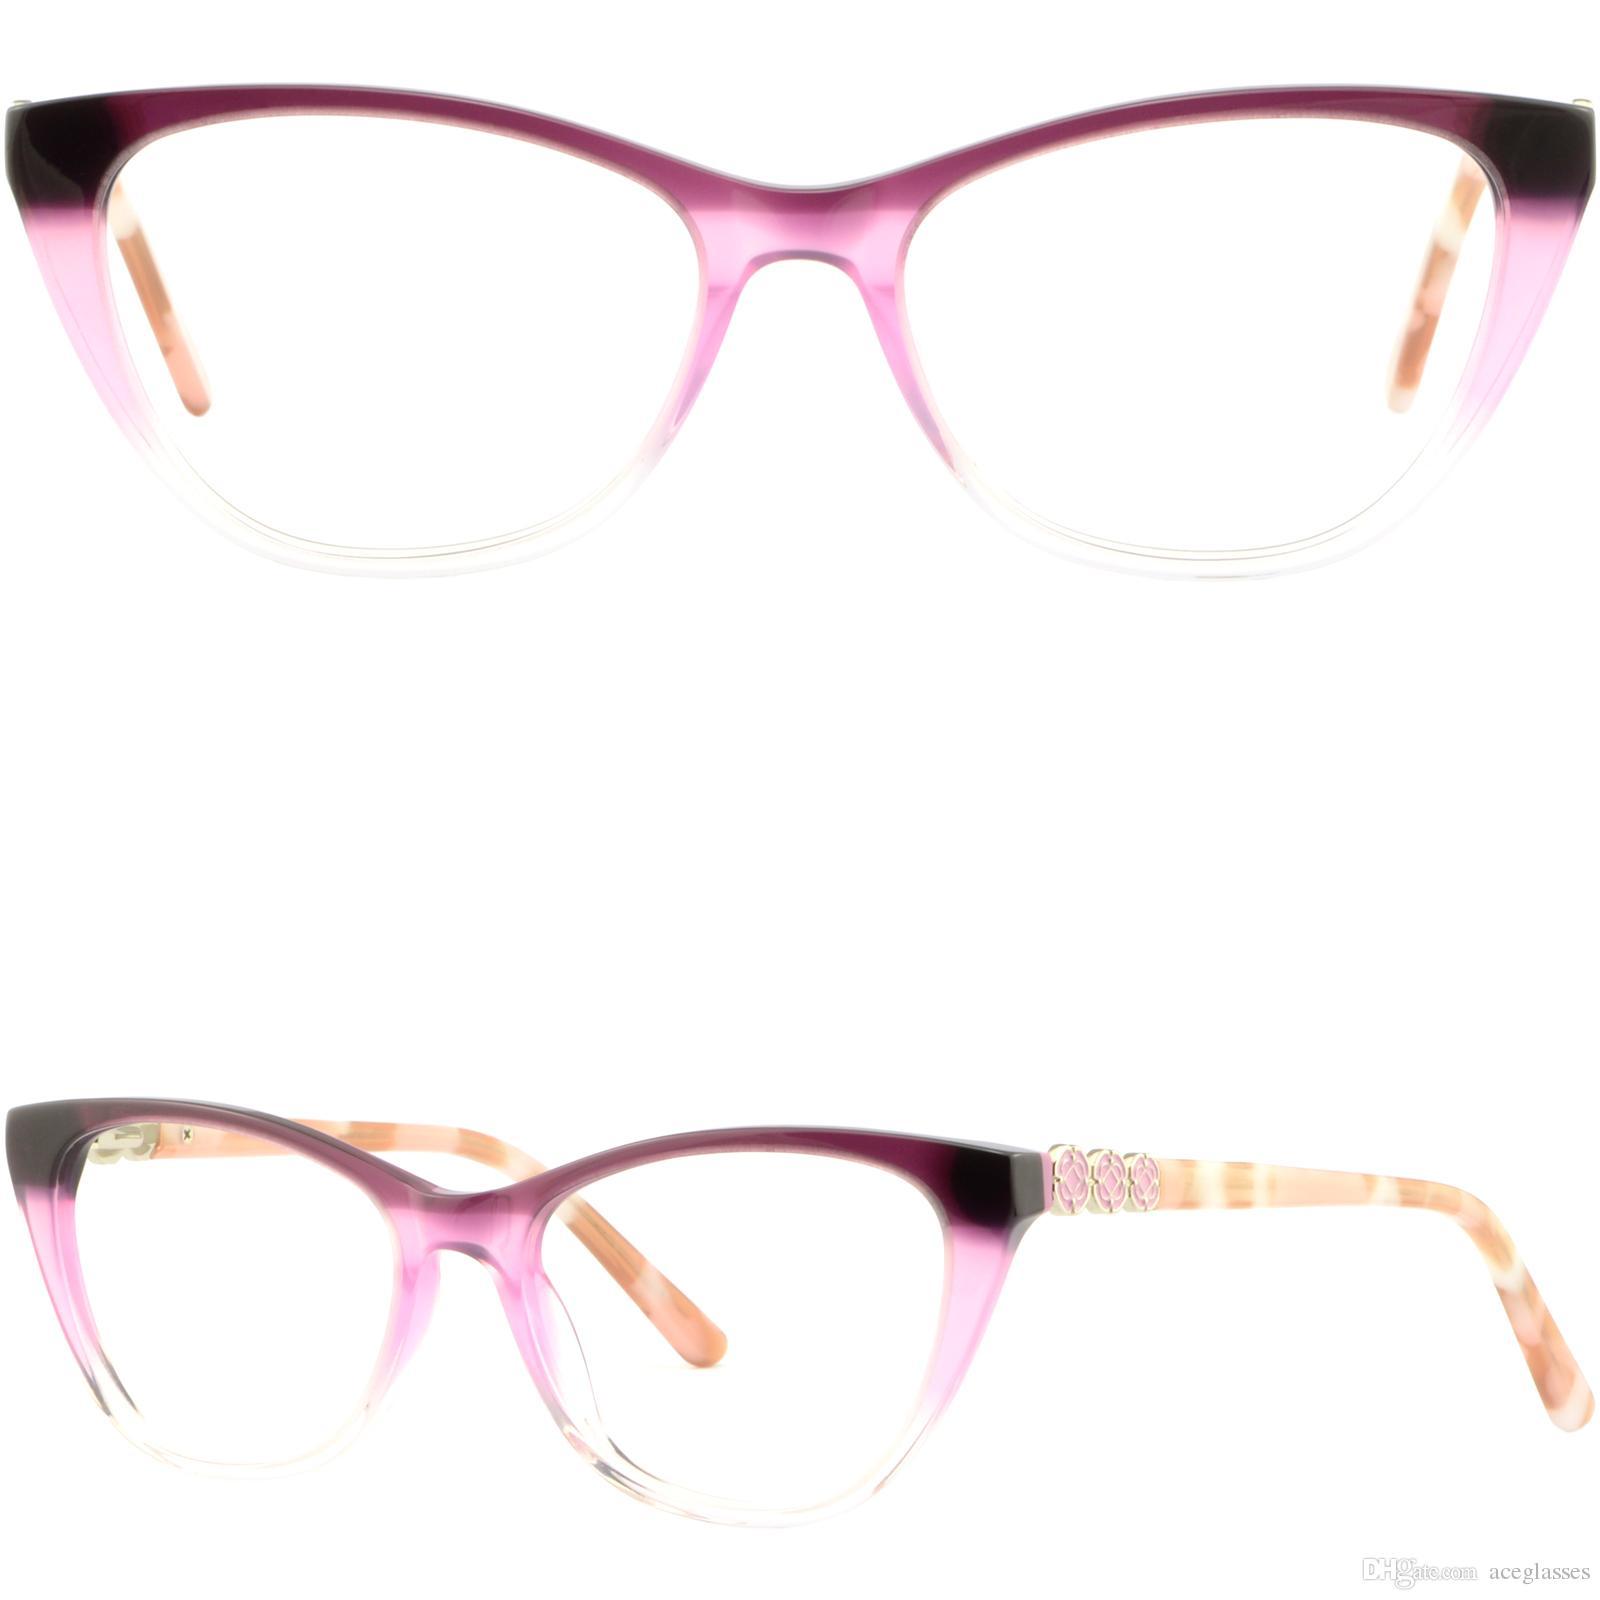 Light Cateye Women Acetate Frame Plastic Prescription Glasses Pink ...